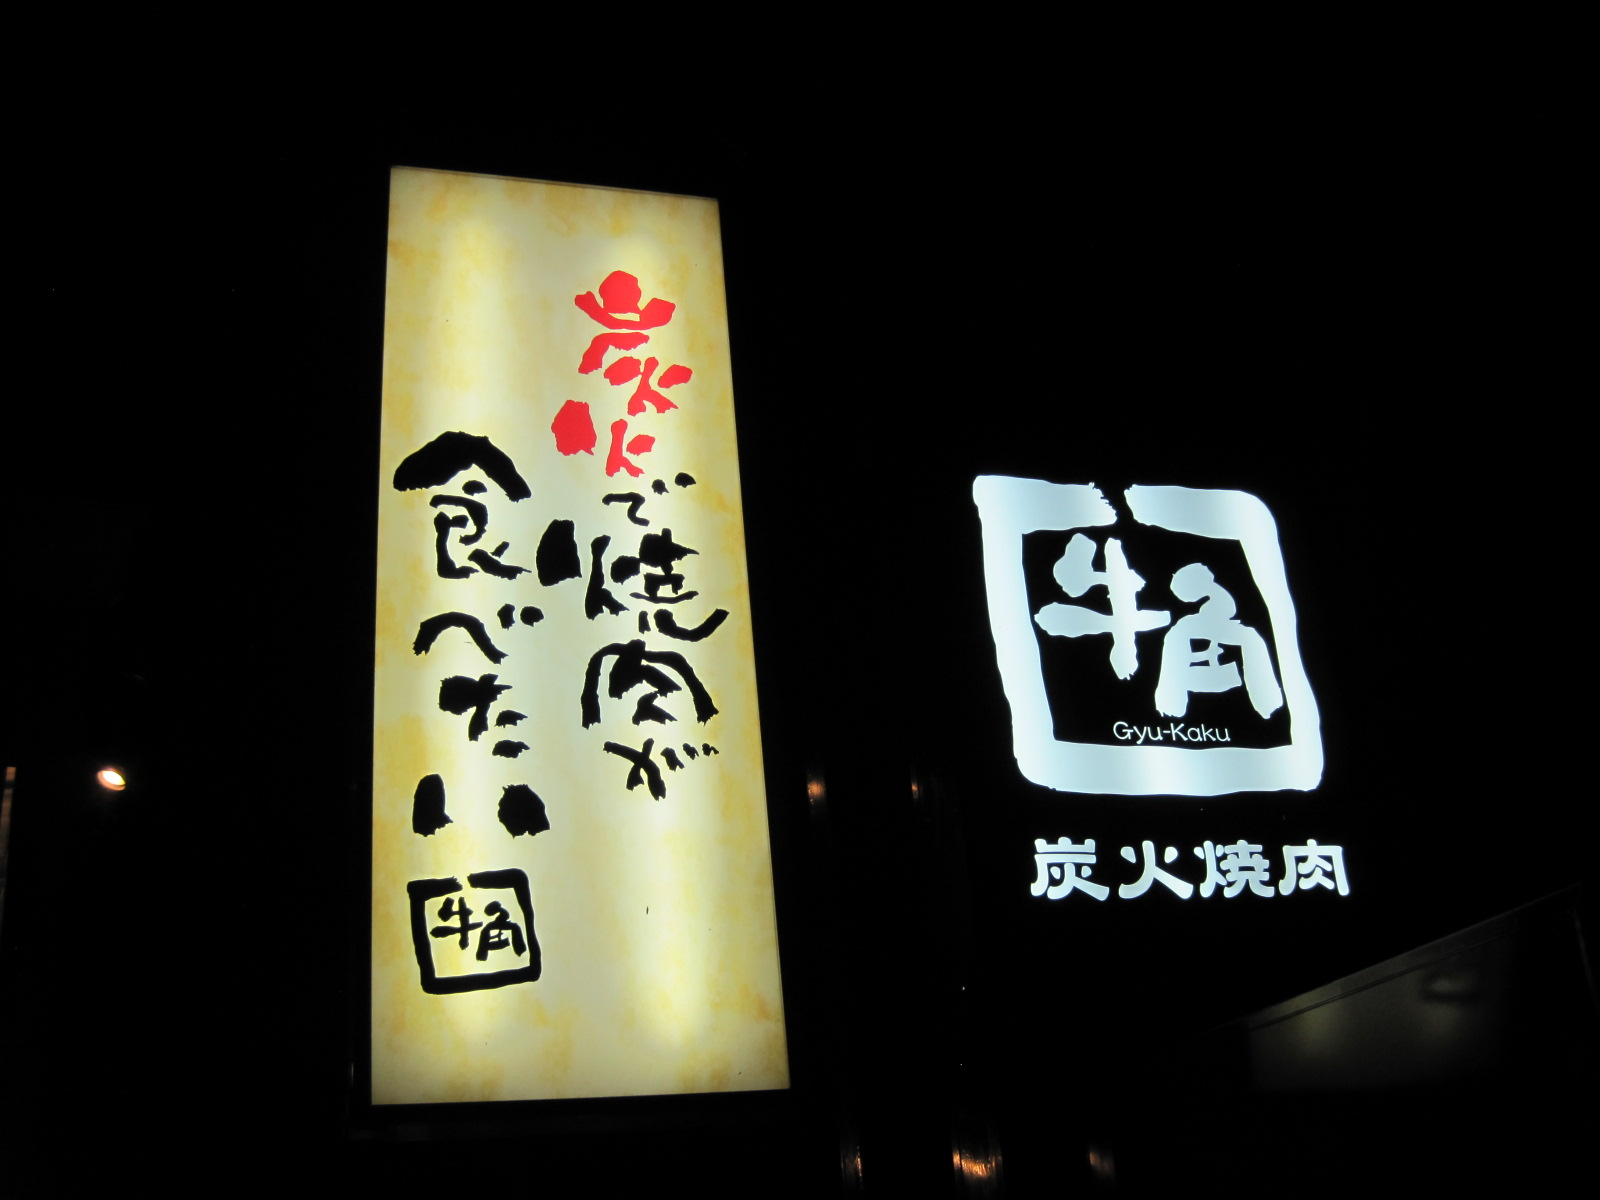 牛角半額フェア@軽井沢店_f0236260_21413316.jpg